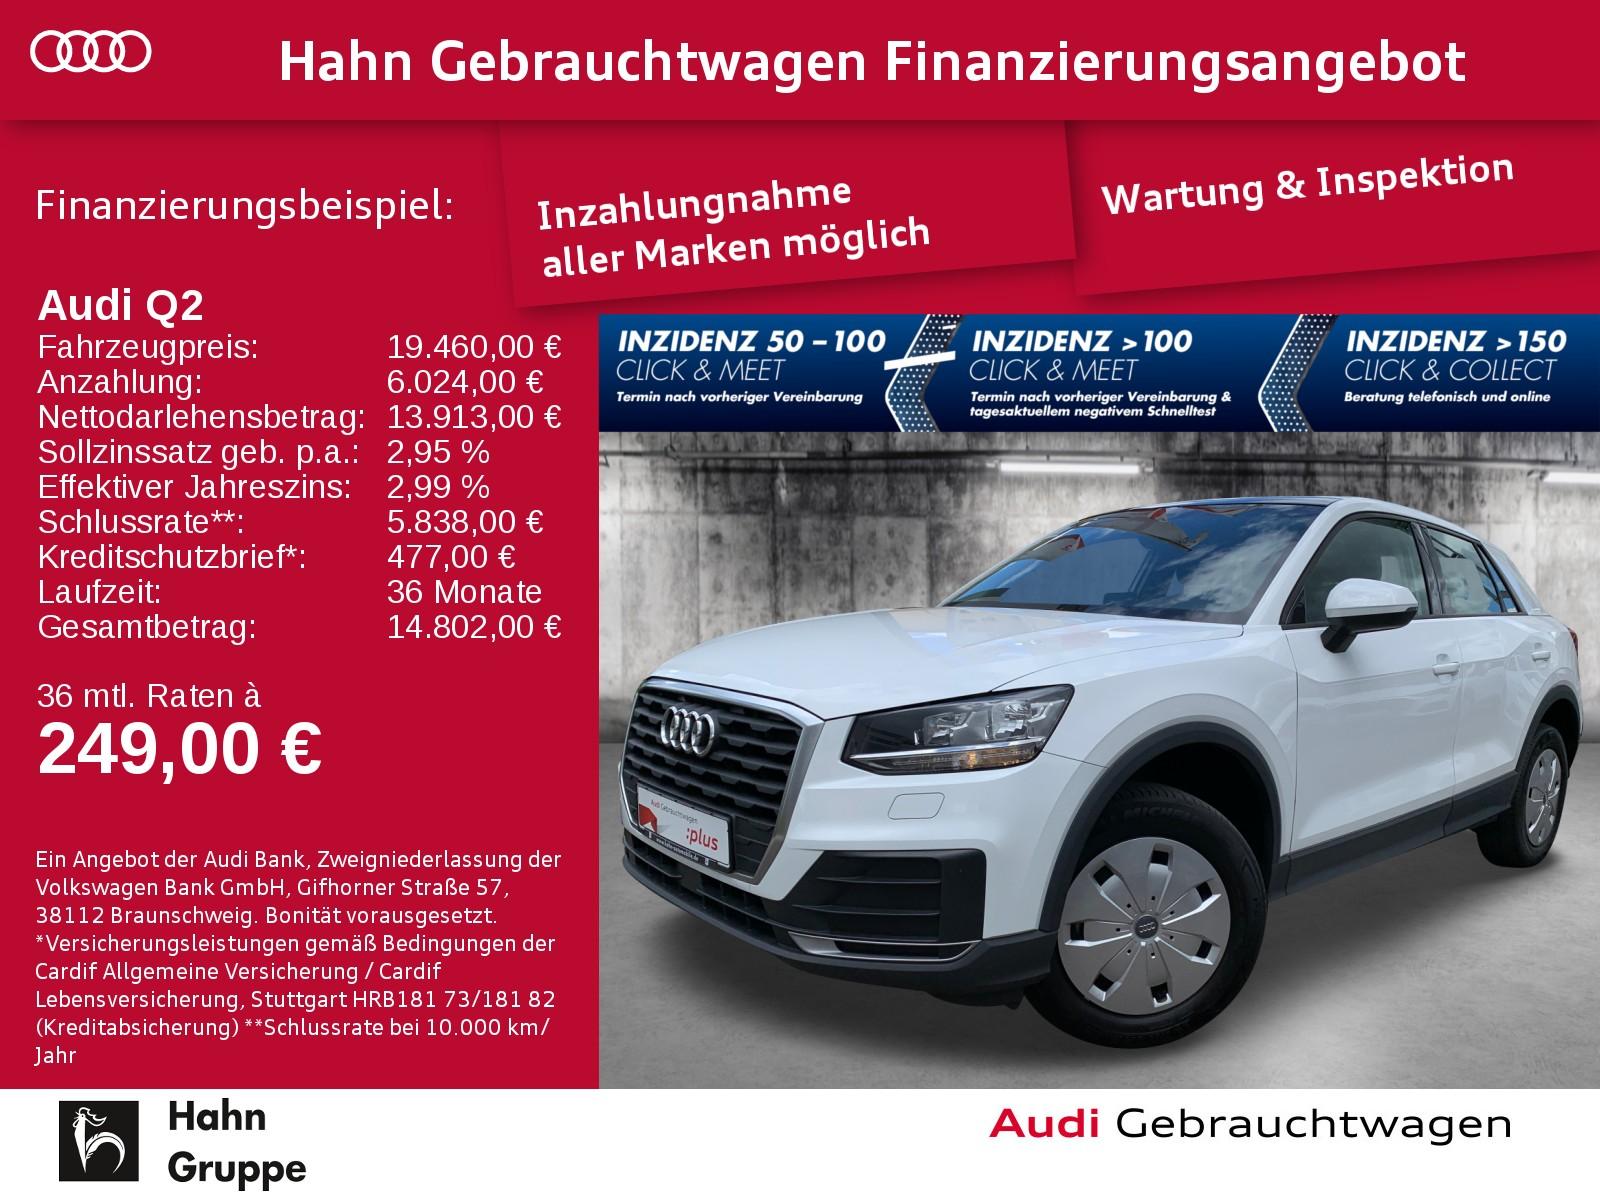 Audi Q2 1.0 TFSI Pano Sitzh Einpark Klima Radio, Jahr 2018, Benzin